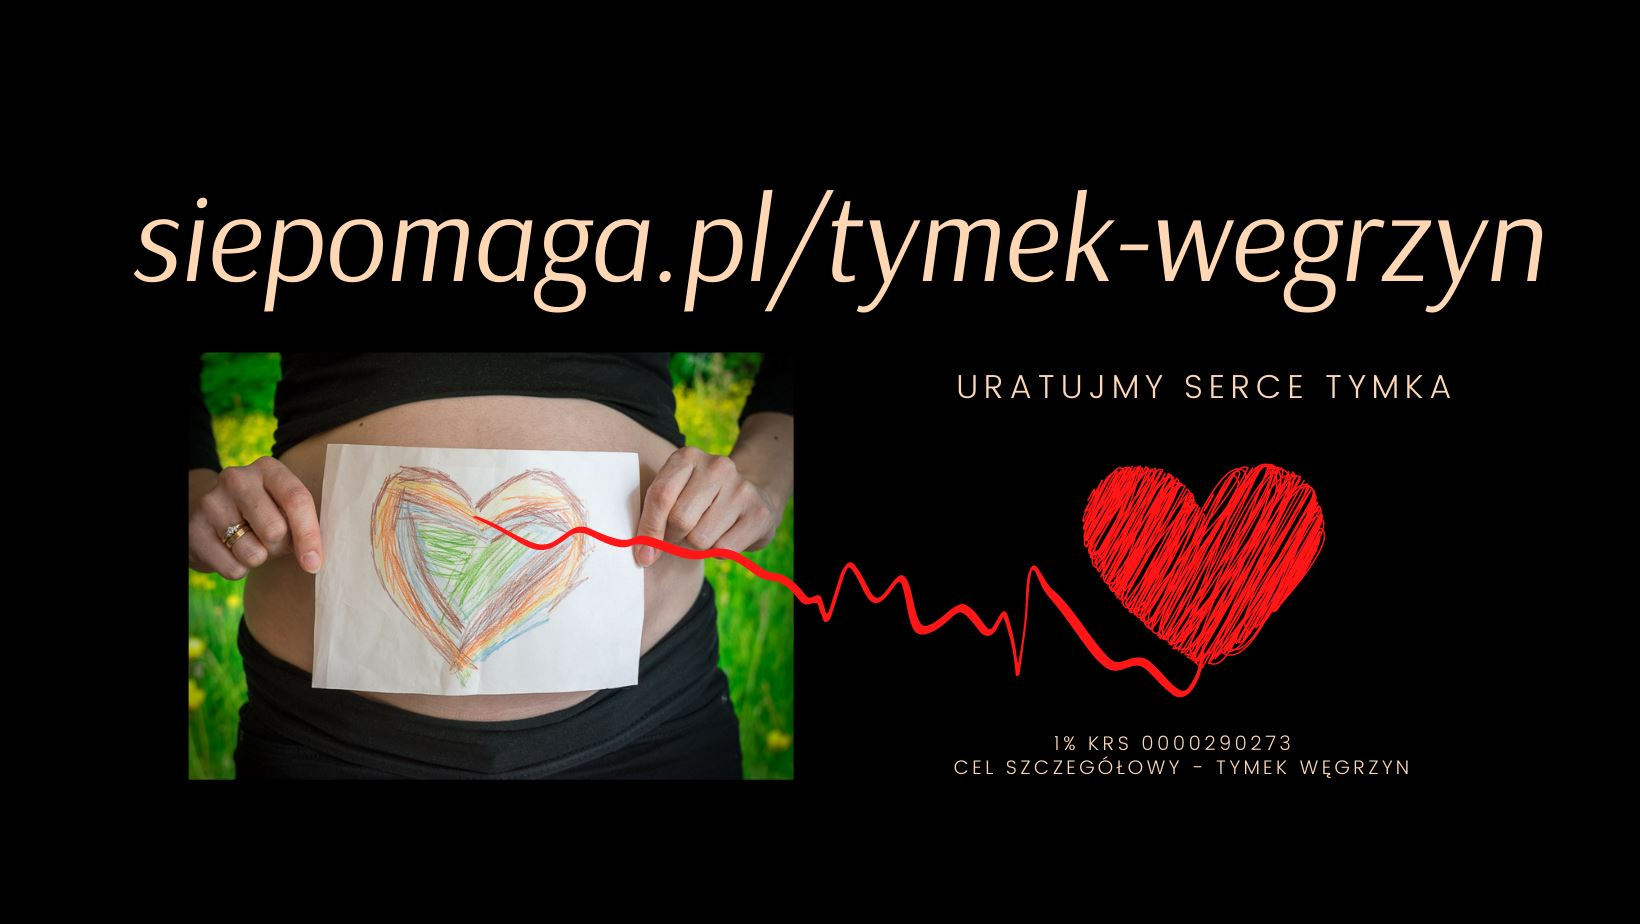 Uratujmy serce Tymka